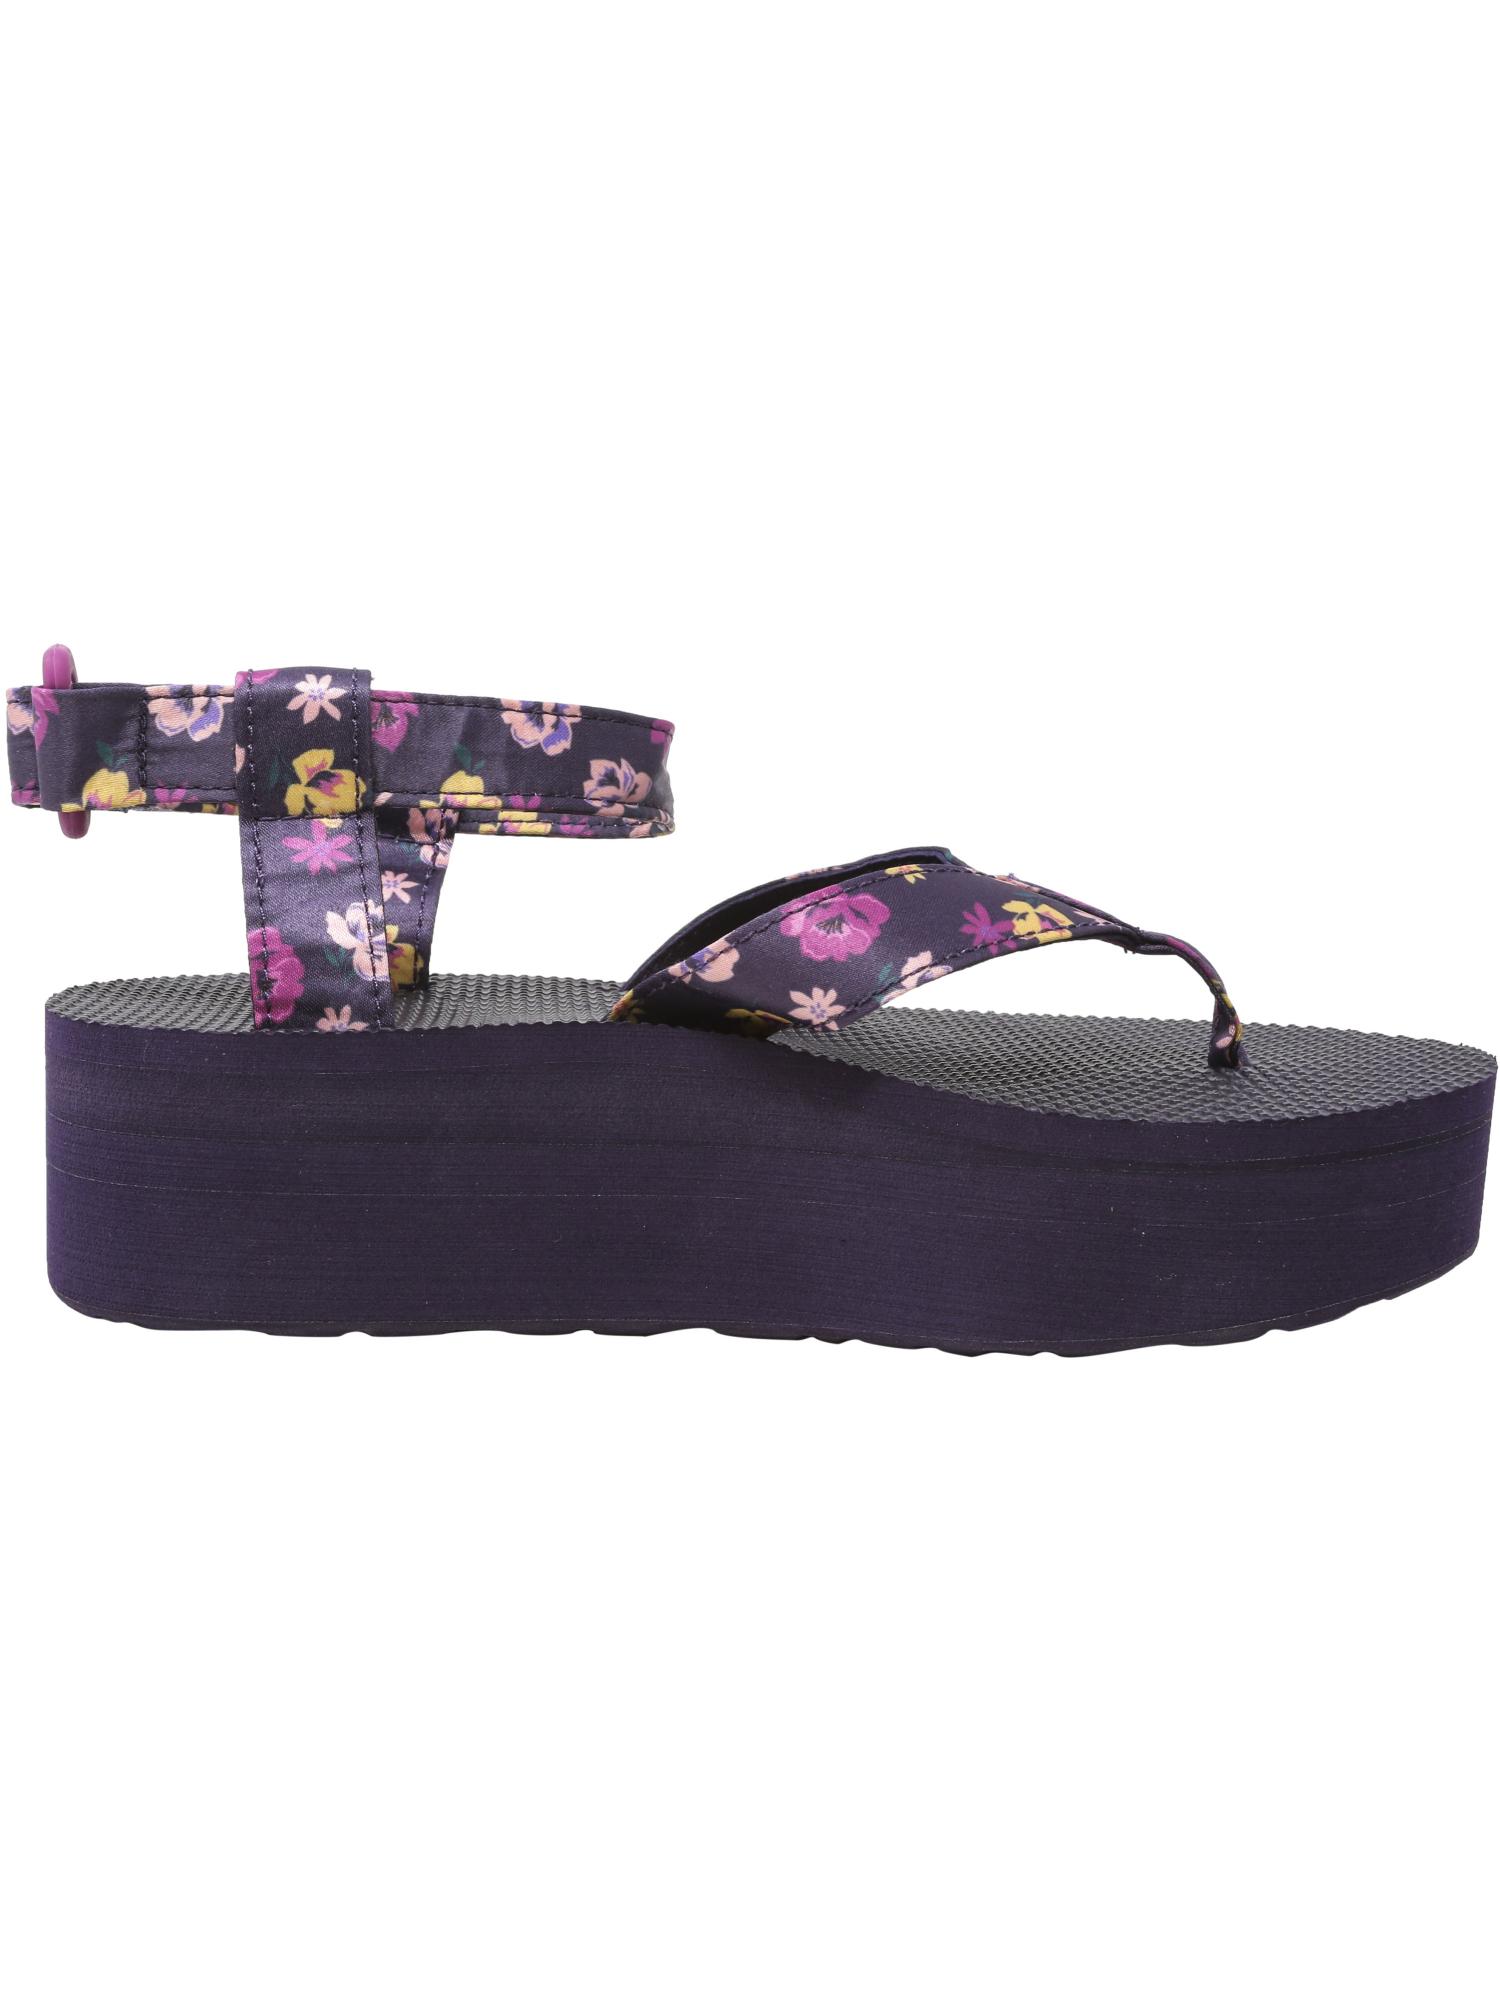 Teva-Women-039-s-Flatform-Sandal-Floral-Ankle-High thumbnail 14